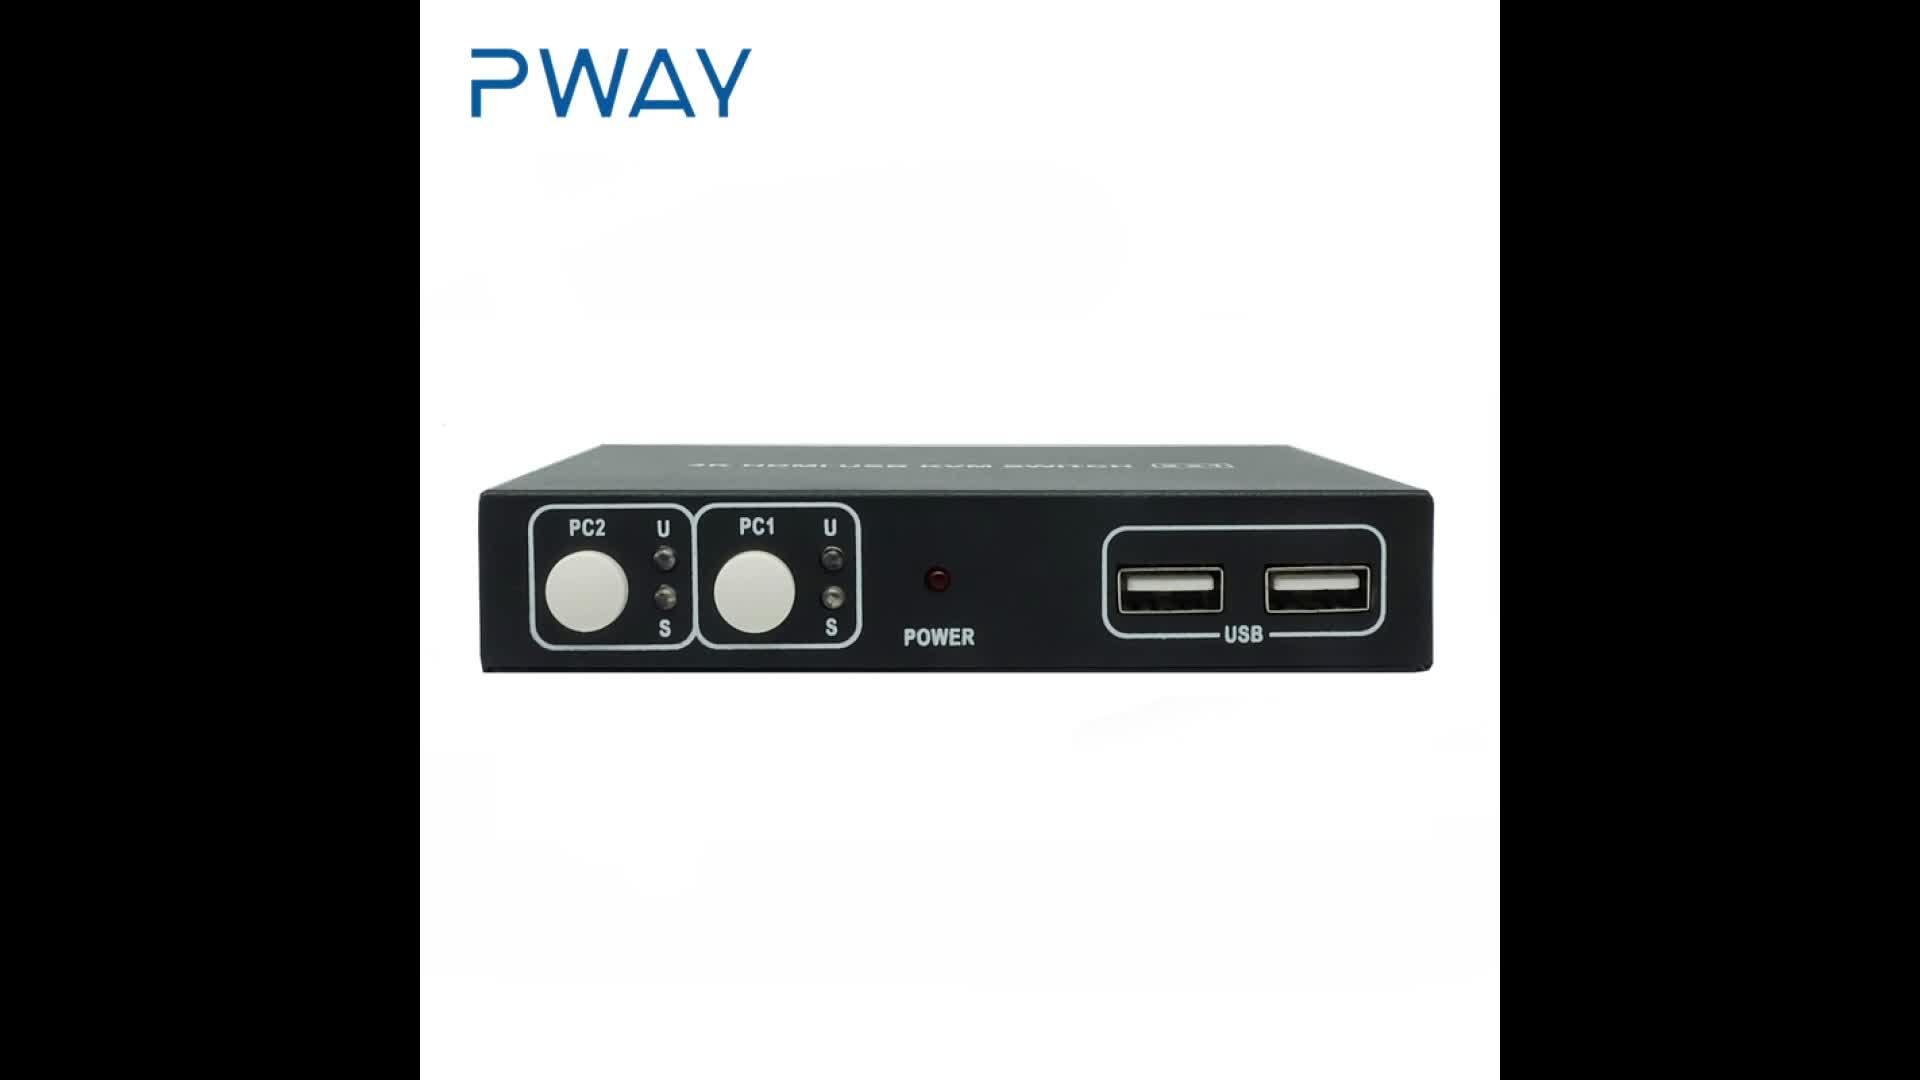 Pinwei PW-SH0201K resolution max up to 4Kx2K@30Hz supports Hot Key switch HD KVM switch